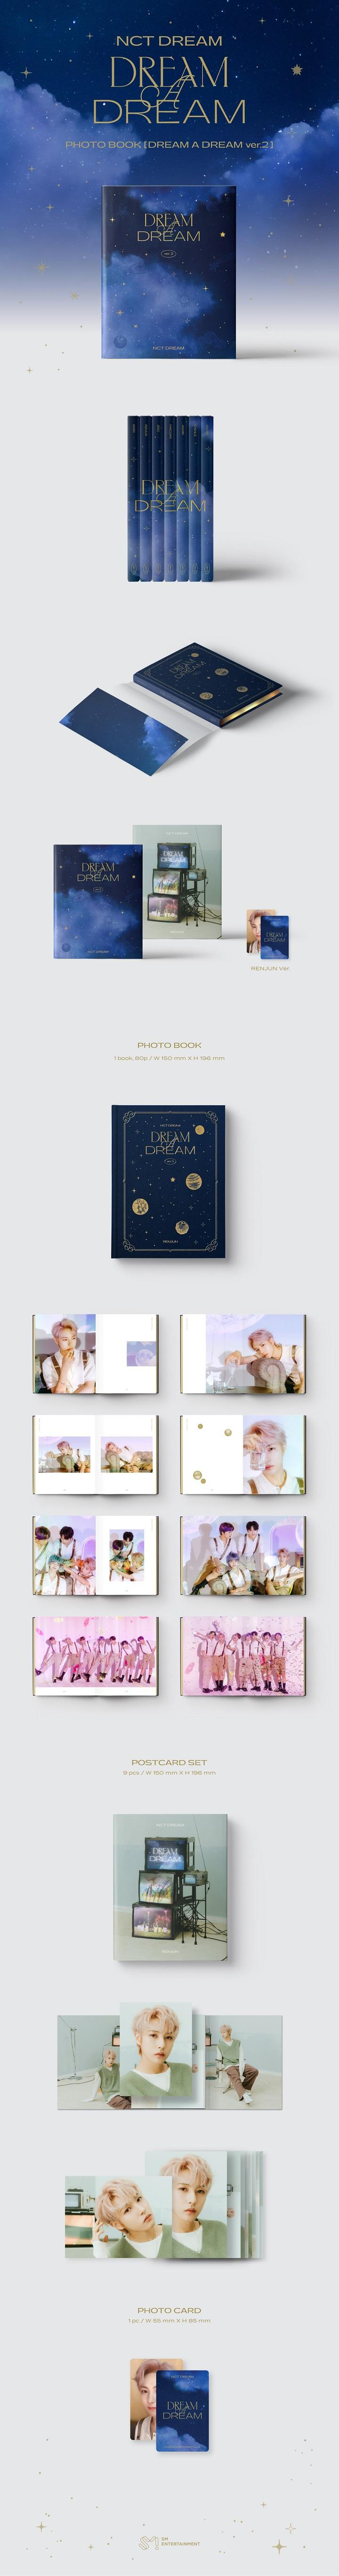 NCT DREAM-PHOTOBOOK [DREAM A DREAM ver.2] [ENJUN]